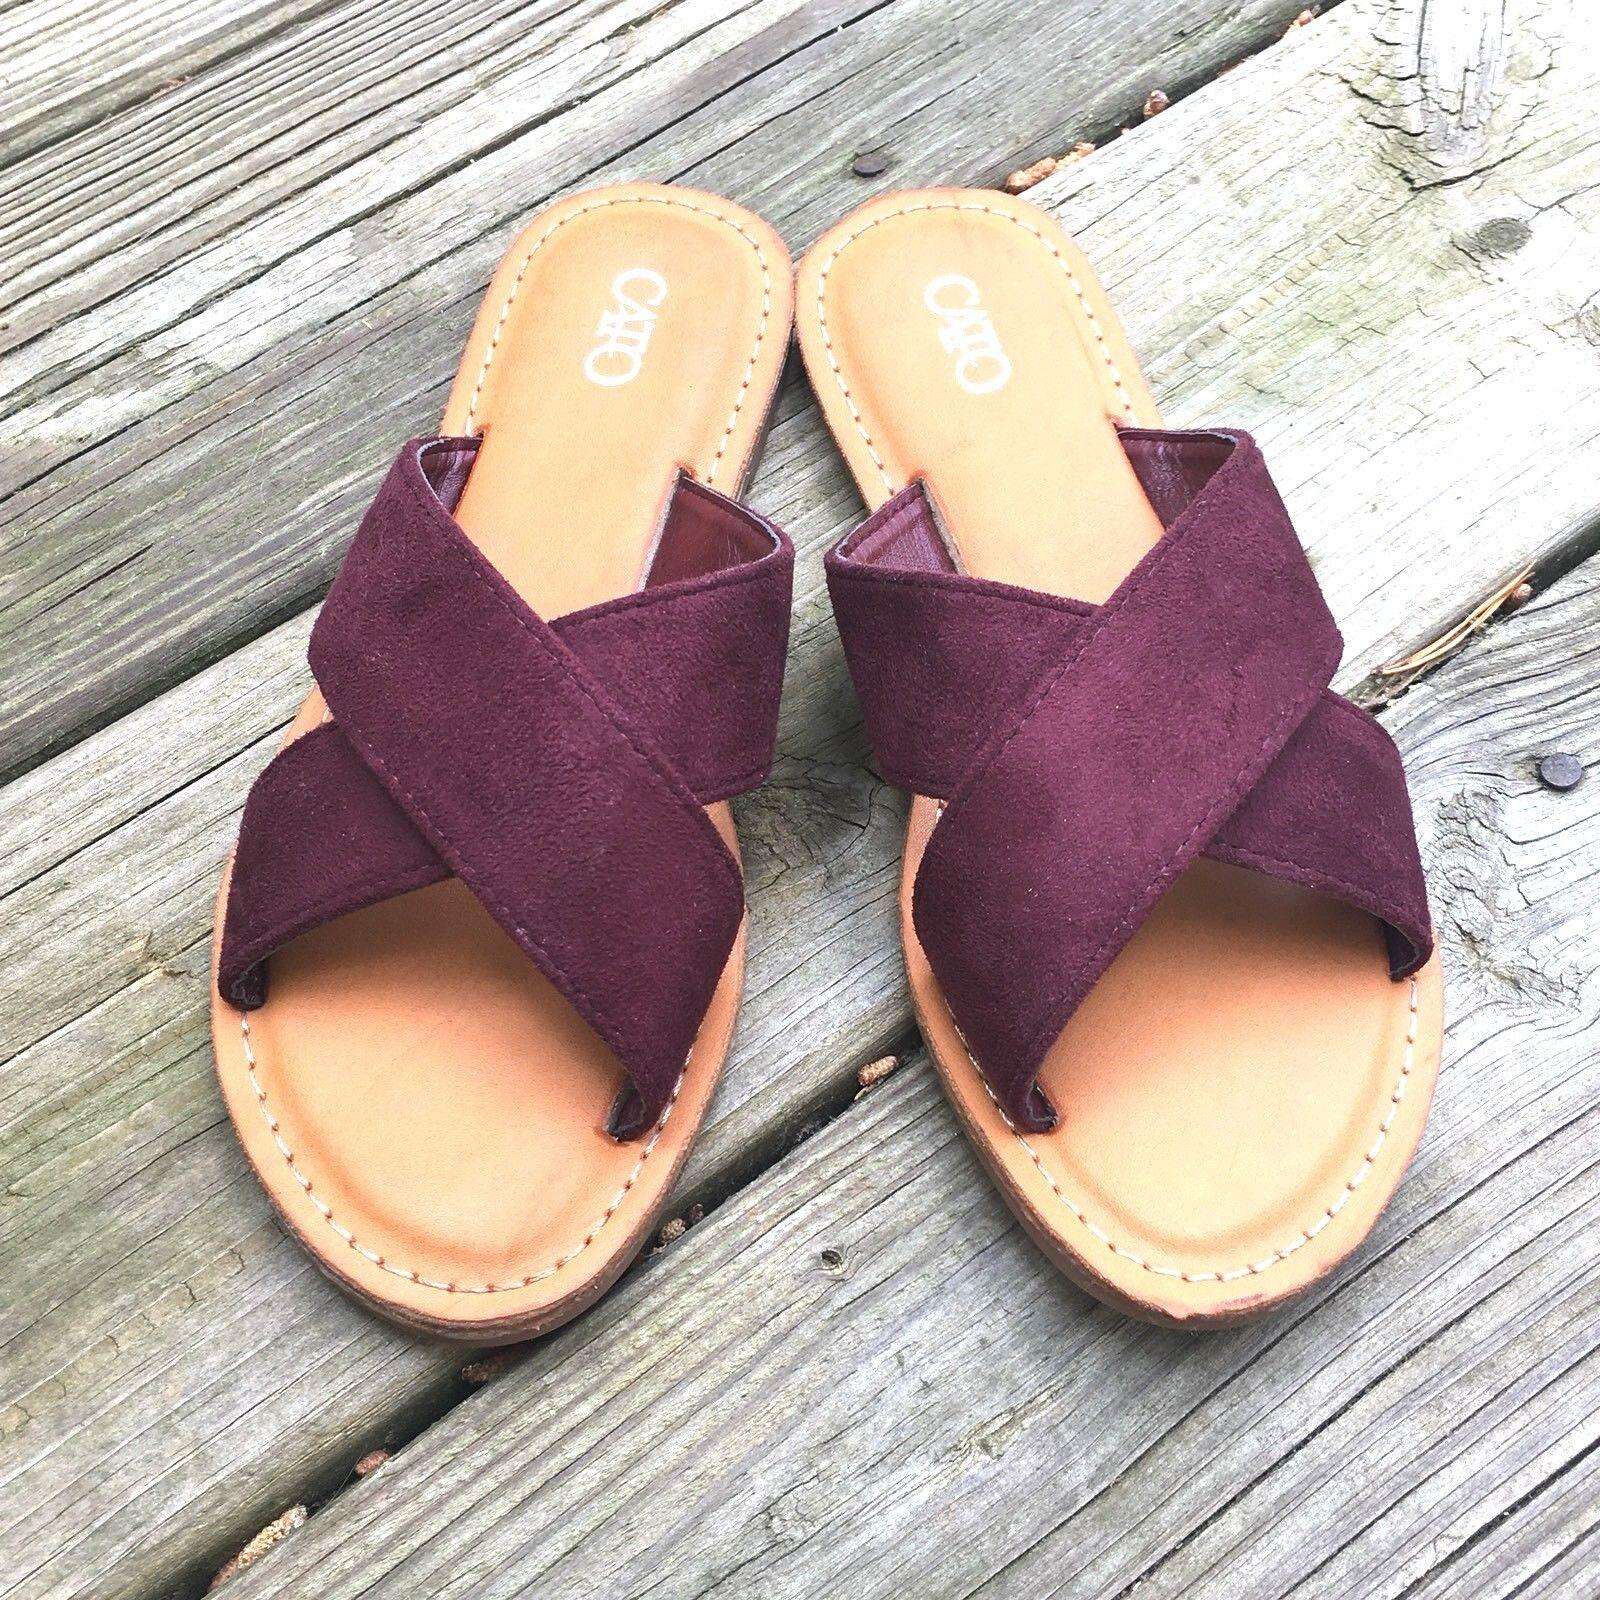 Cato Womens Sandals Size 6M Burgundy Slip On Flats Worn Cross Foot Clean Never Worn Flats 0cf225